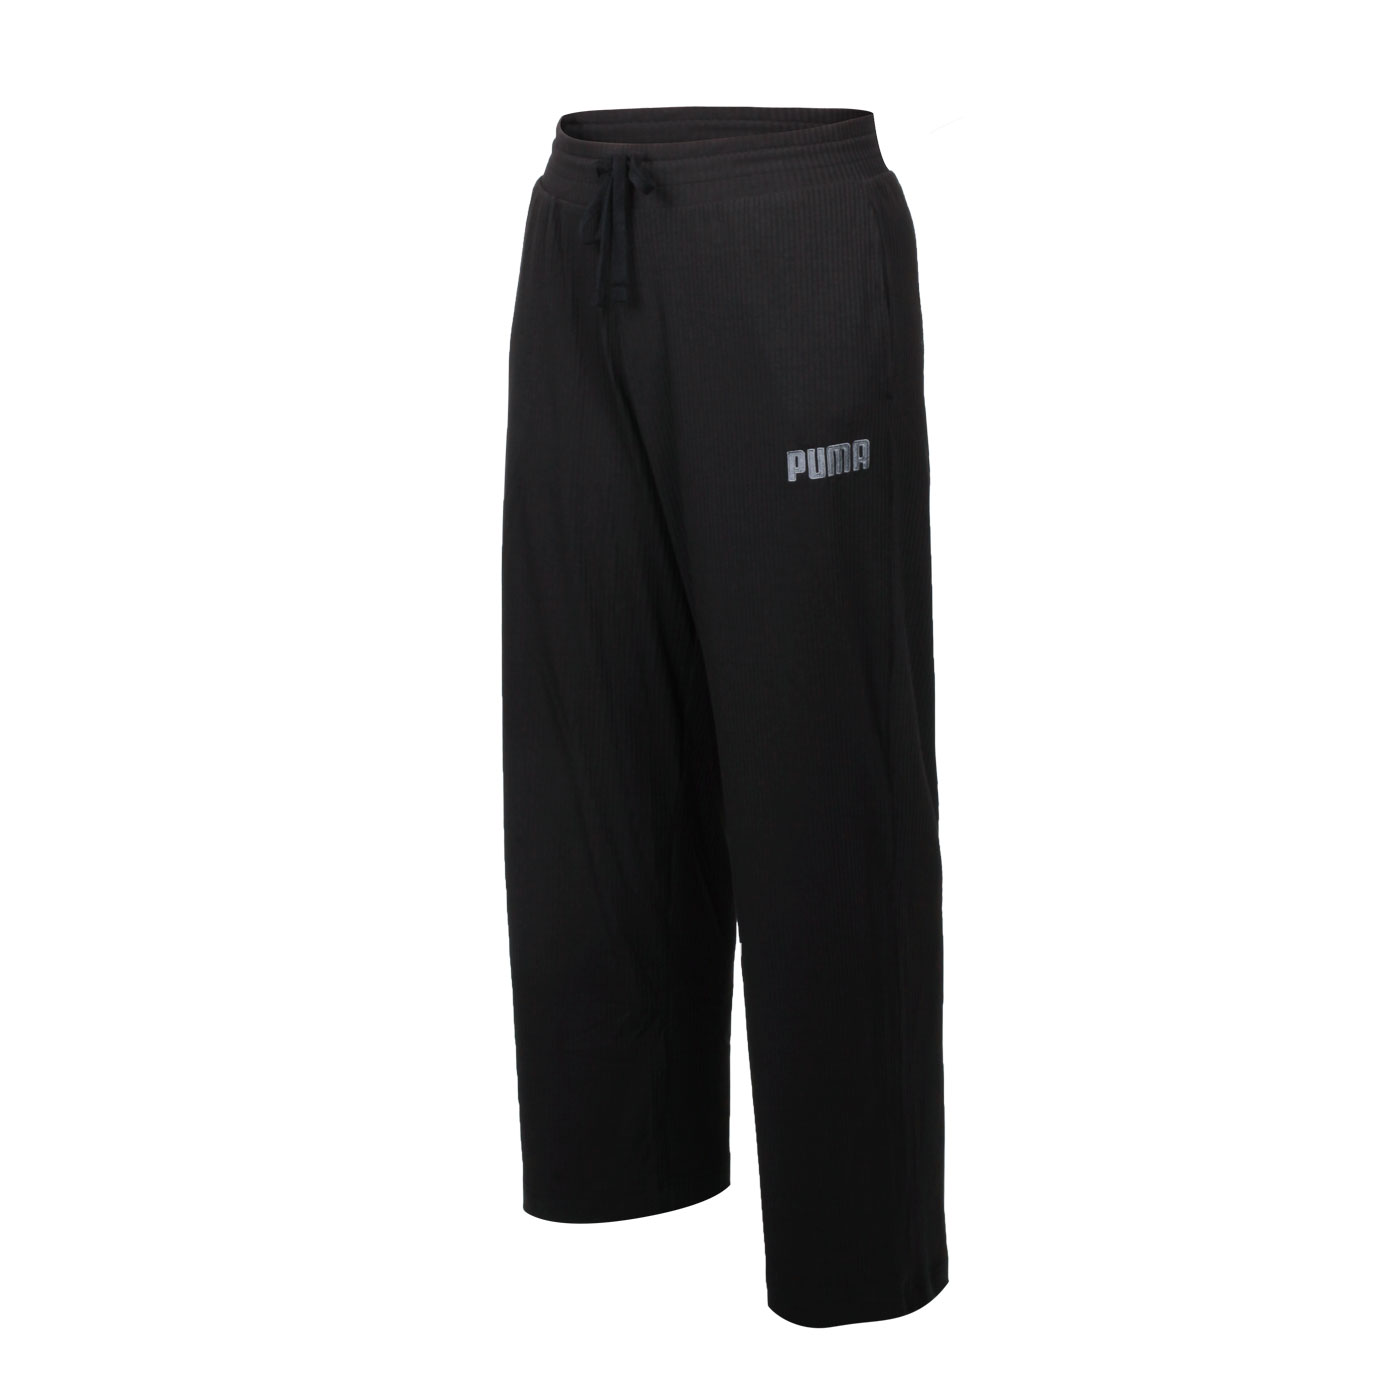 PUMA 女款基本系列Modern Basics羅紋寬褲 58593801